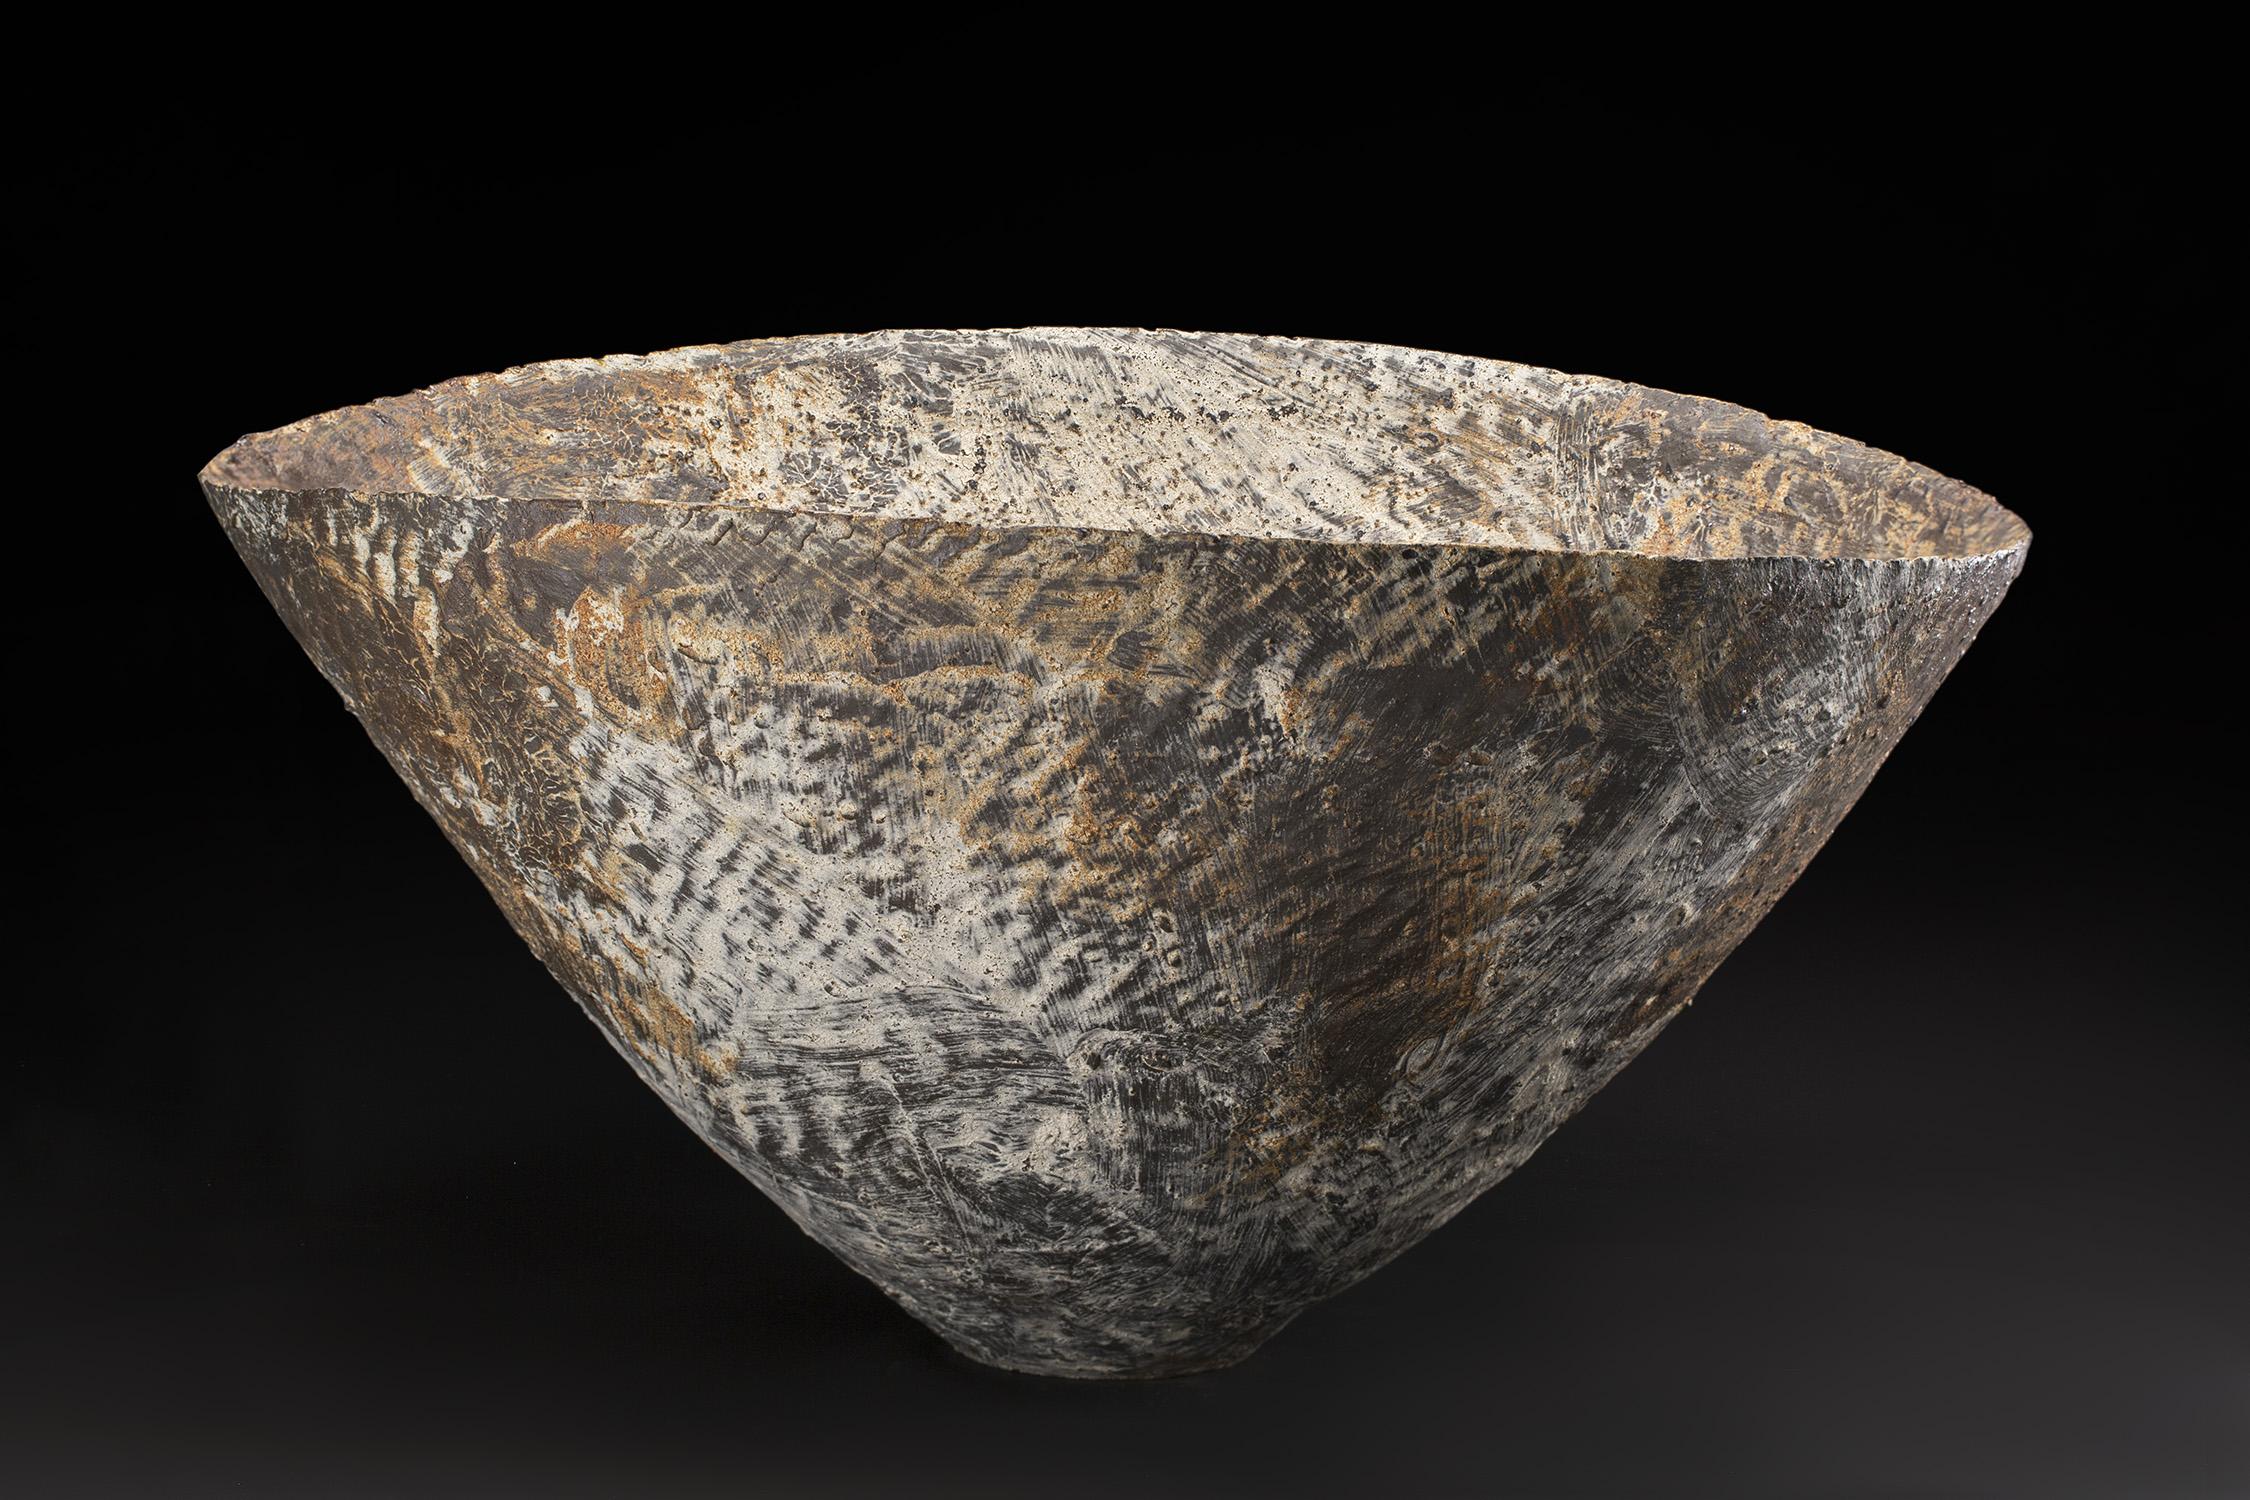 Akihiro Nikaido  Flower Vase  , 2019 Ceramic 12 x 22.5 x 20 inches 30.5 x 57.2 x 50.8 cm ANk 73